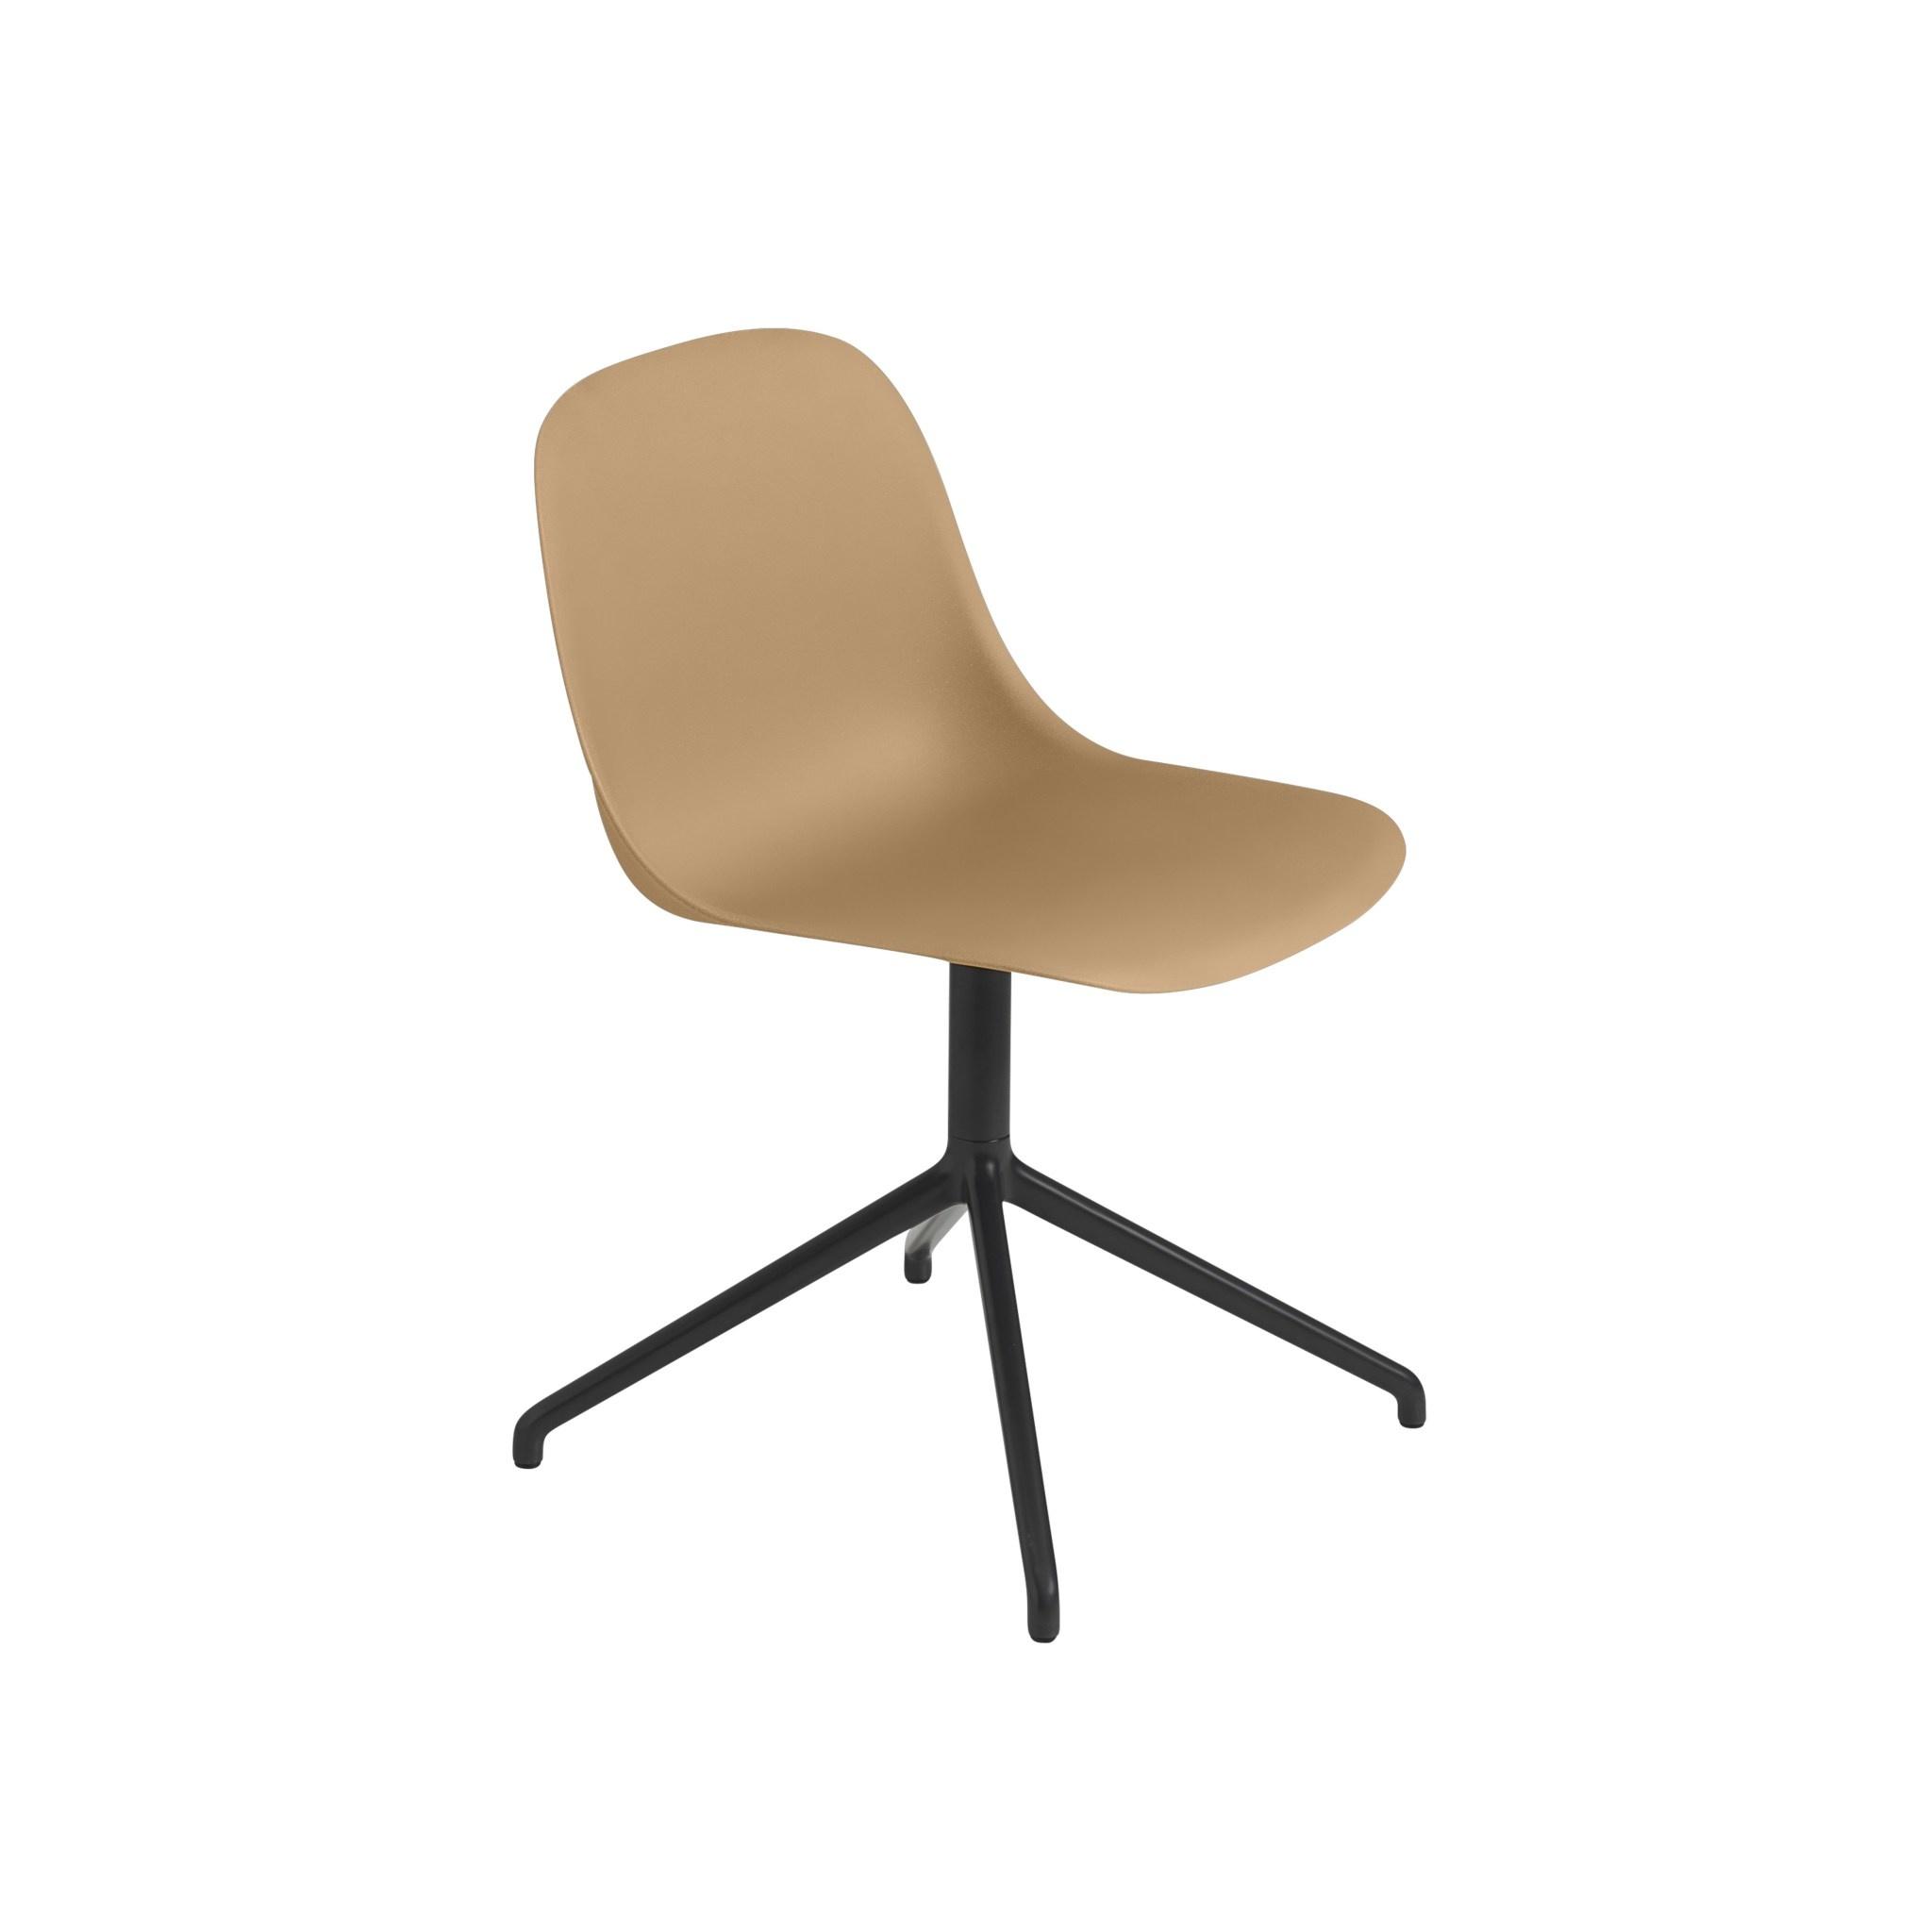 Fiber side chair swivel base w.o. return-1